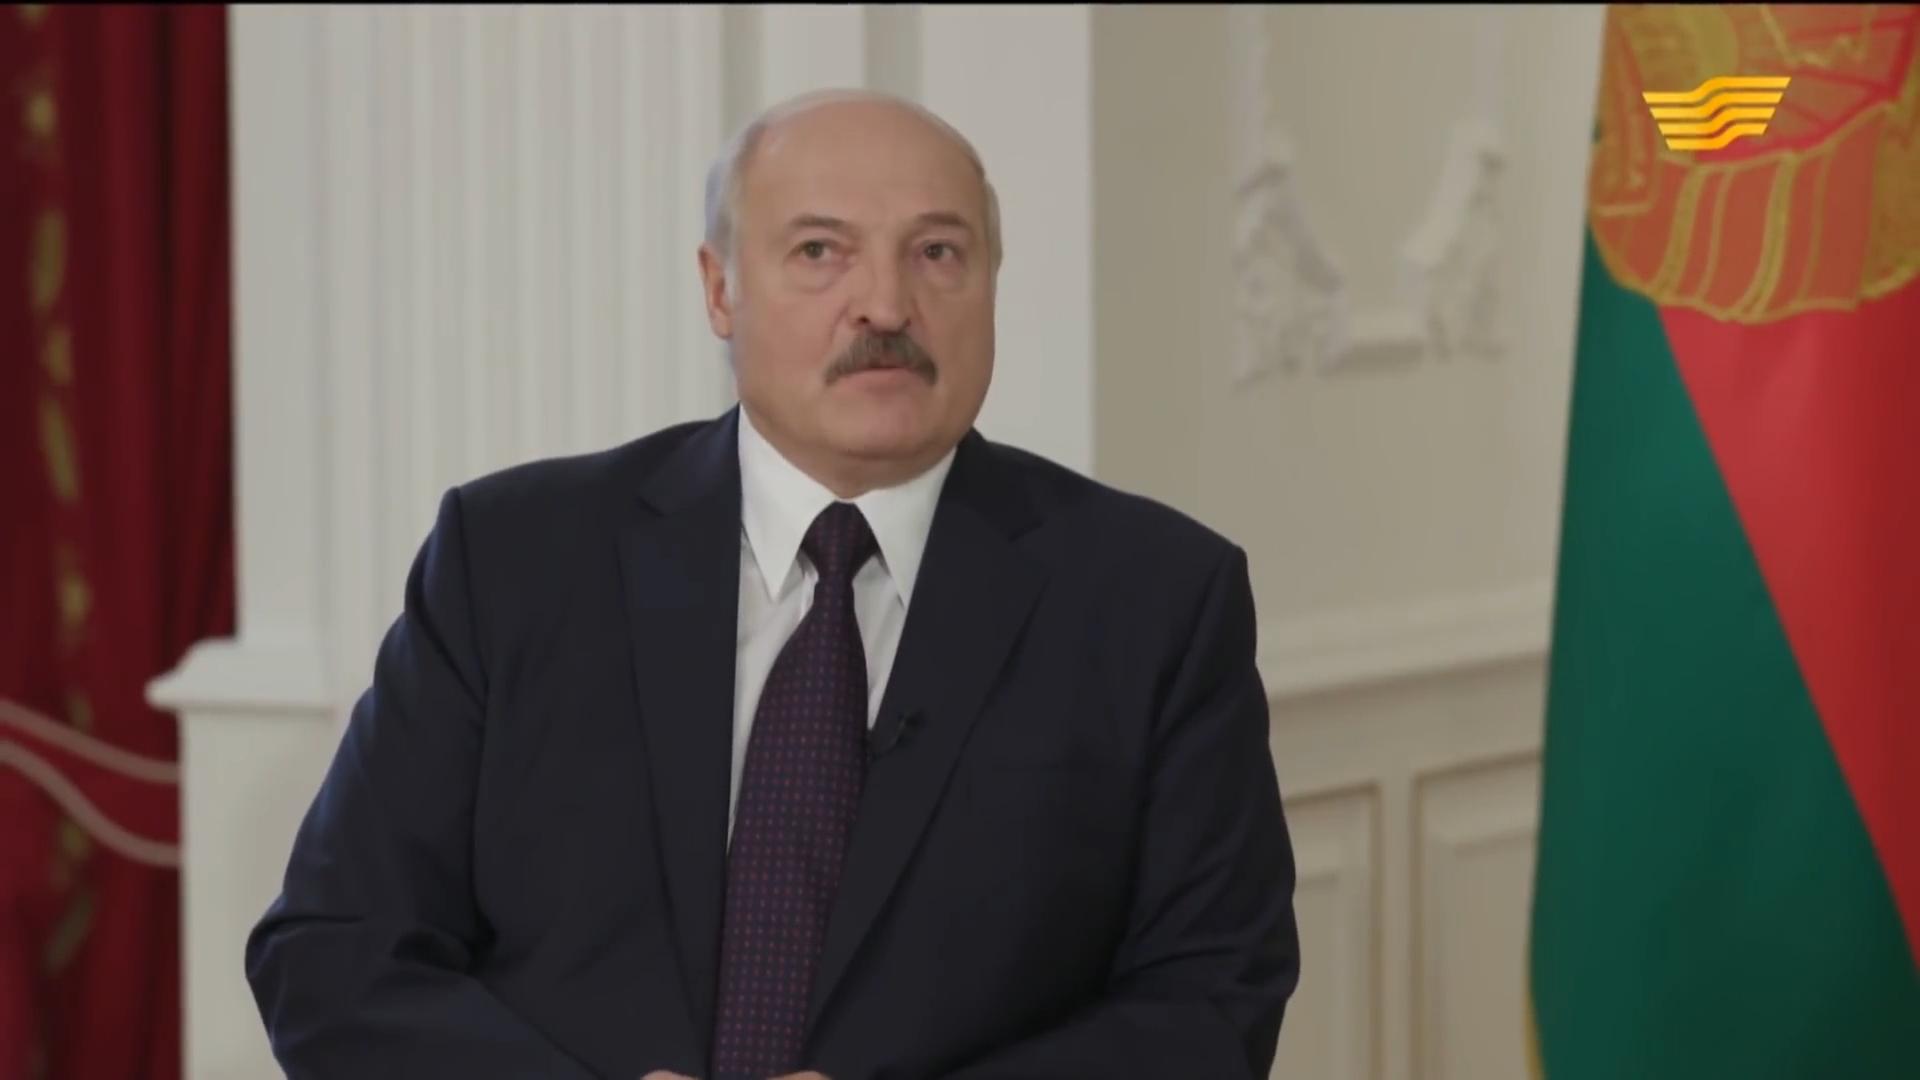 20191022_20-40-Александр Лукашенко дал эксклюзивное интервью телеканалу «Хабар»-scr32